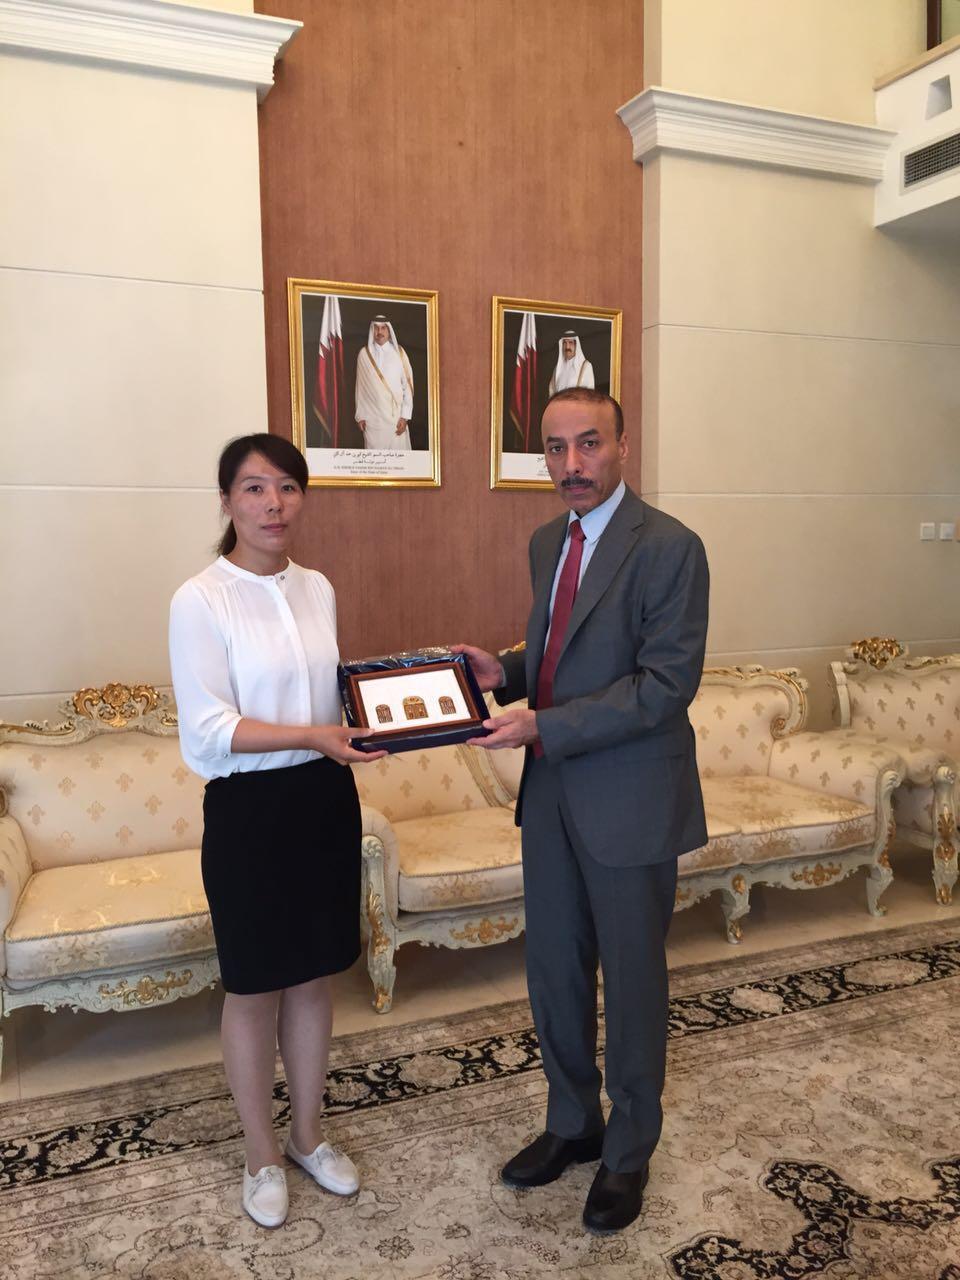 Secretary General Lucy Cui with Mr. Sultan S. Almansouri, the Ambassador of Qatar